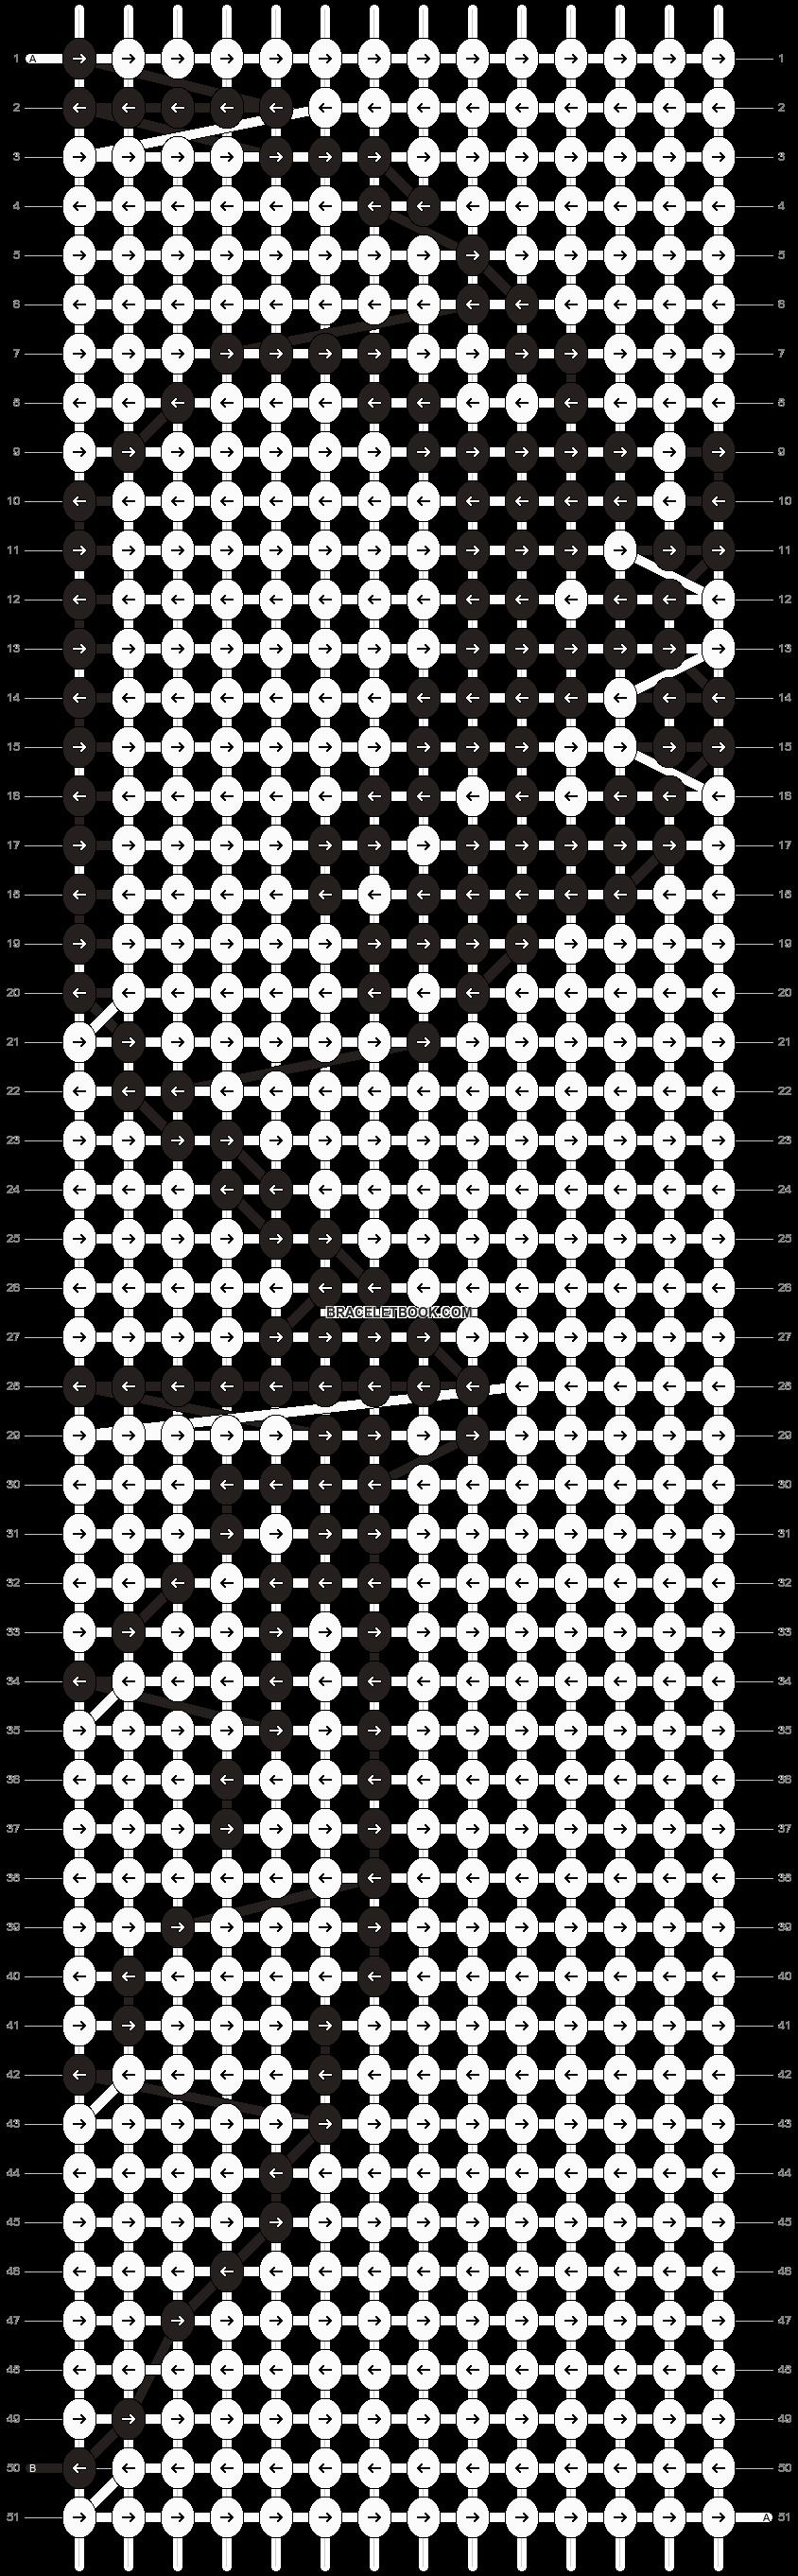 Alpha Pattern #11827 added by ainne382